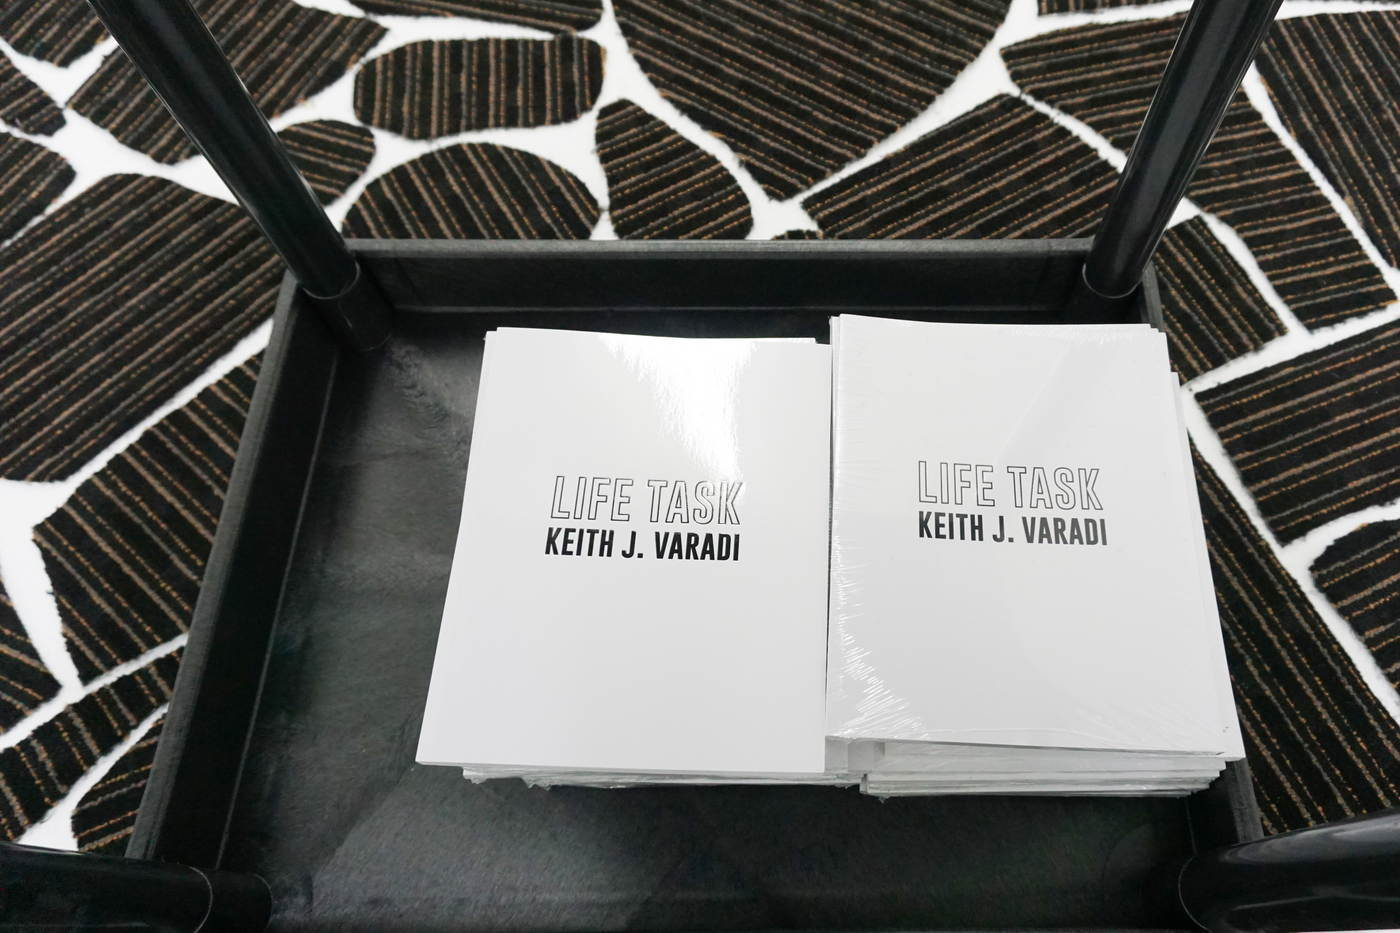 Keith J. Varadi_Life Task